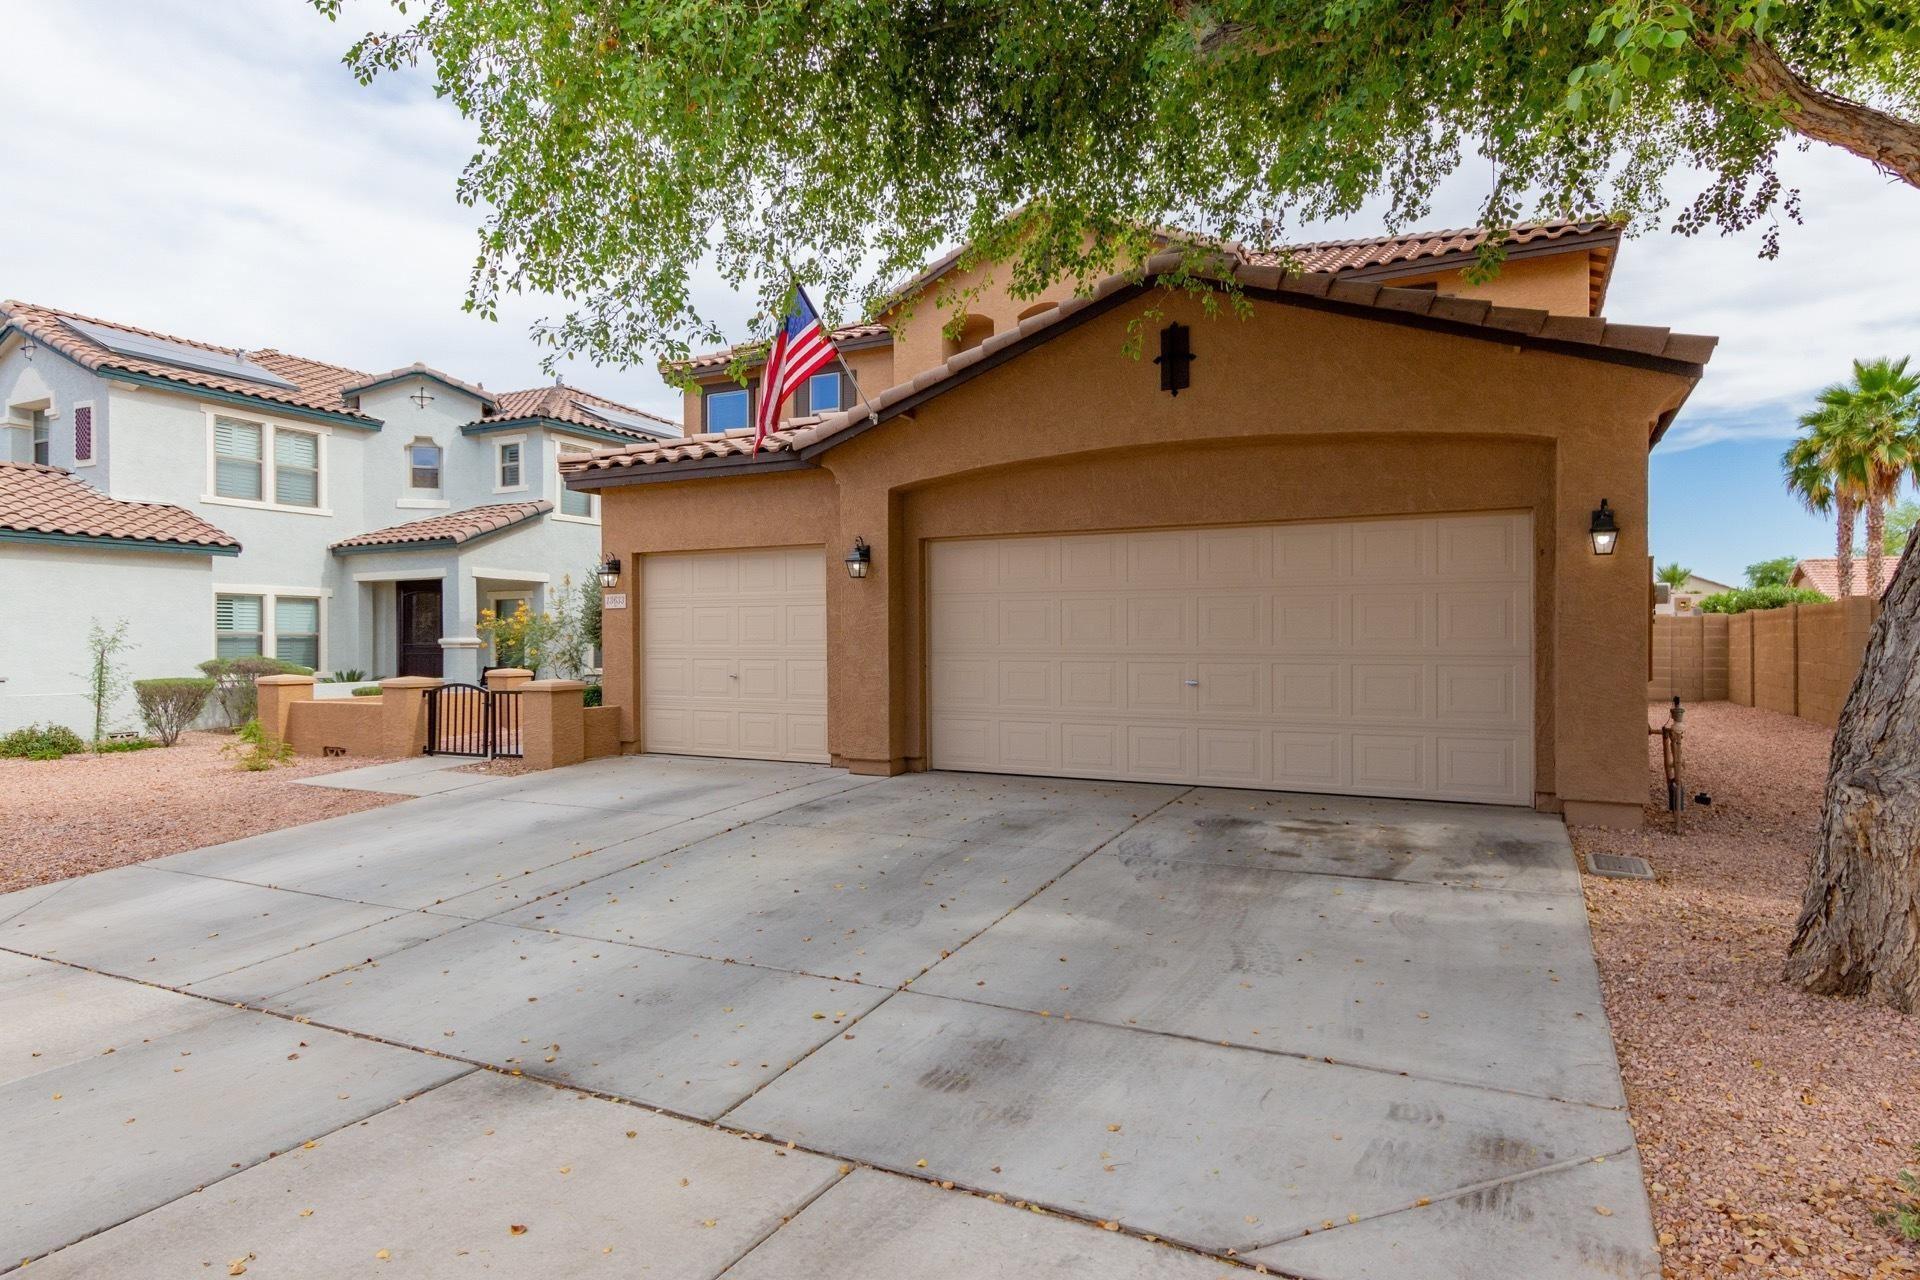 Photo of 13633 W VENTURA Street, Surprise, AZ 85379 (MLS # 6231113)